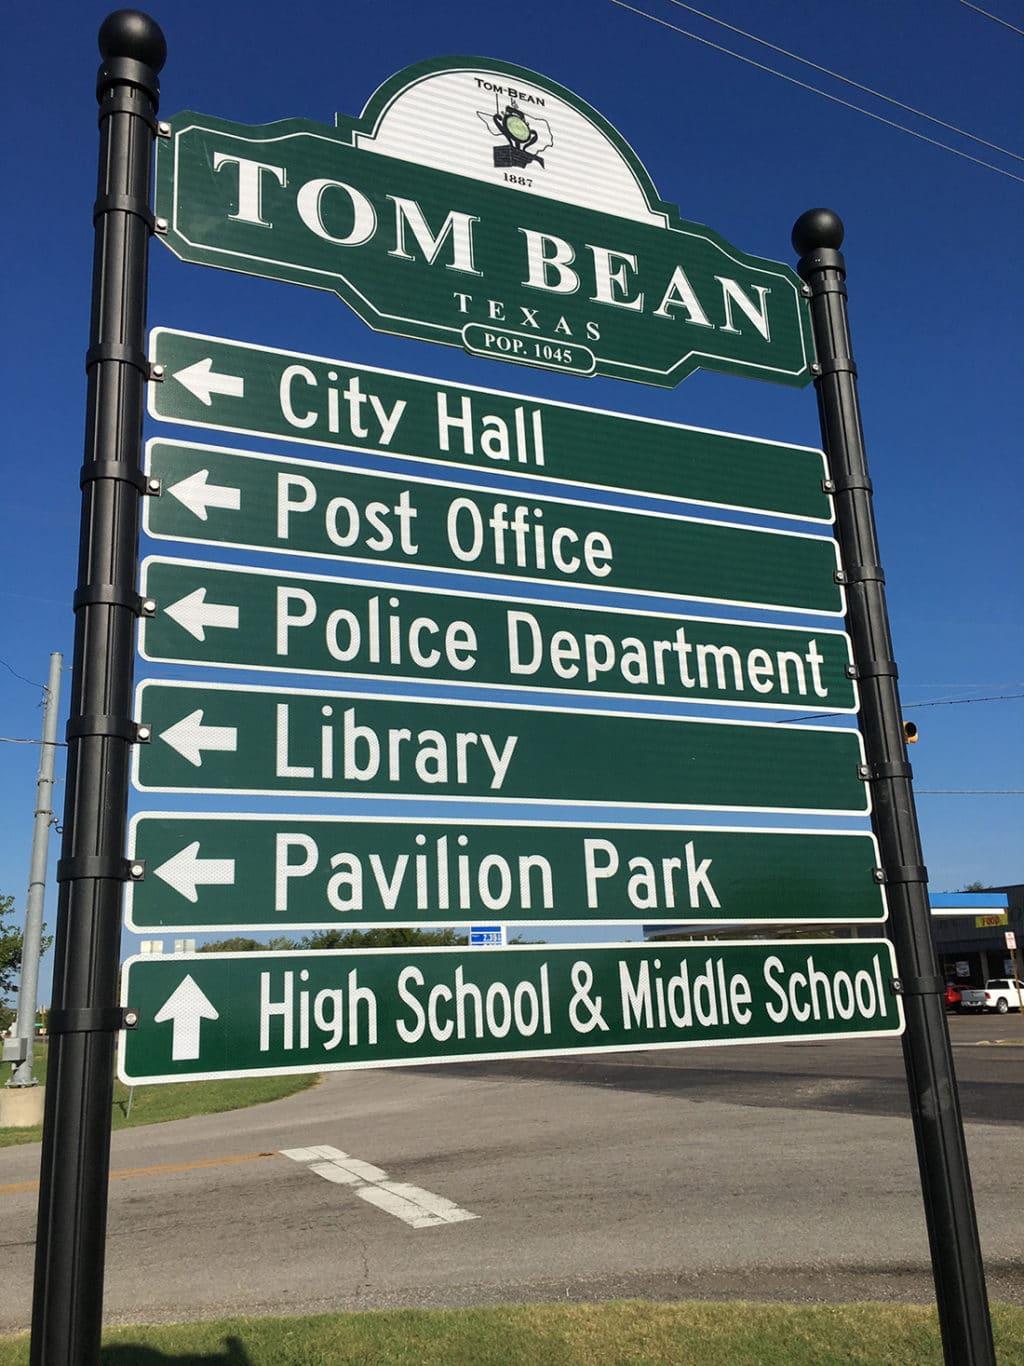 Tom Bean directional sign